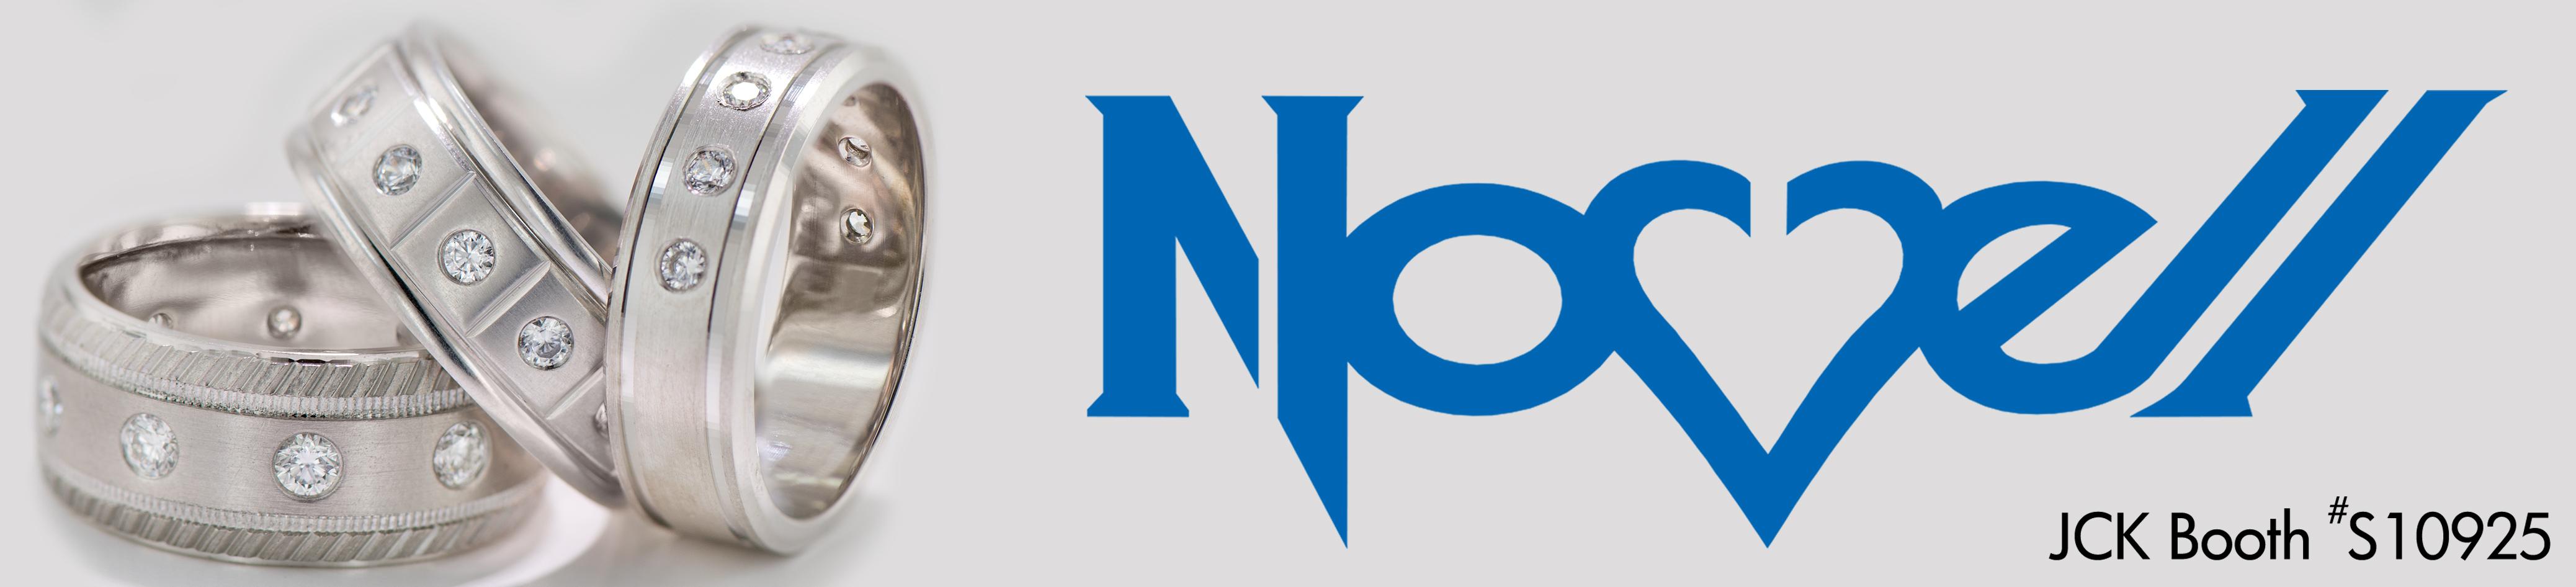 Novell_header_blast 4